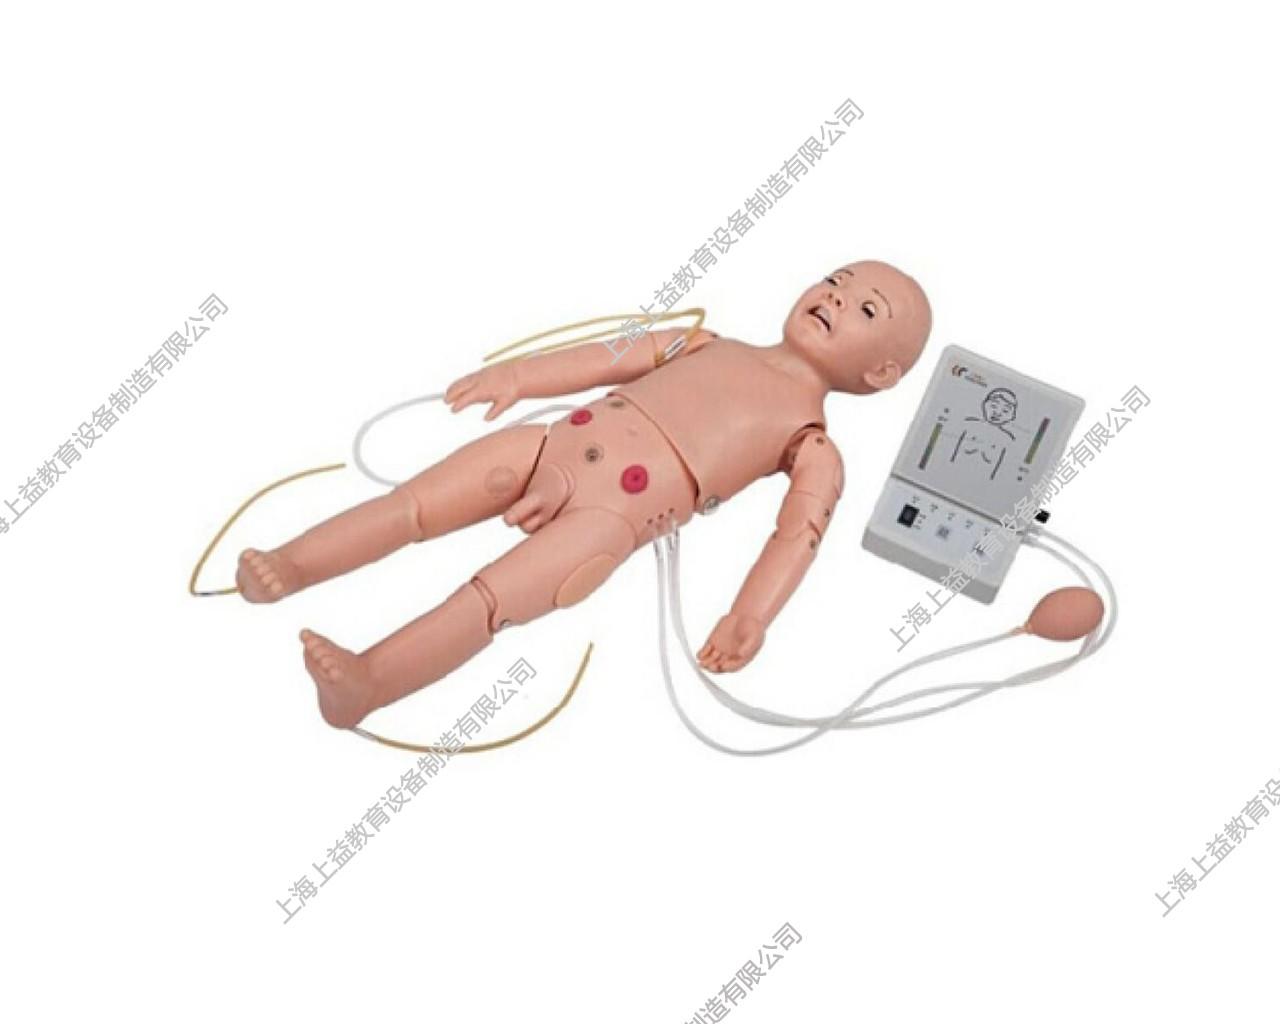 PD5134 全功能一岁儿童高级标准化模拟病人(护理、CPR、听诊、除颤起博、心电监护五合一)